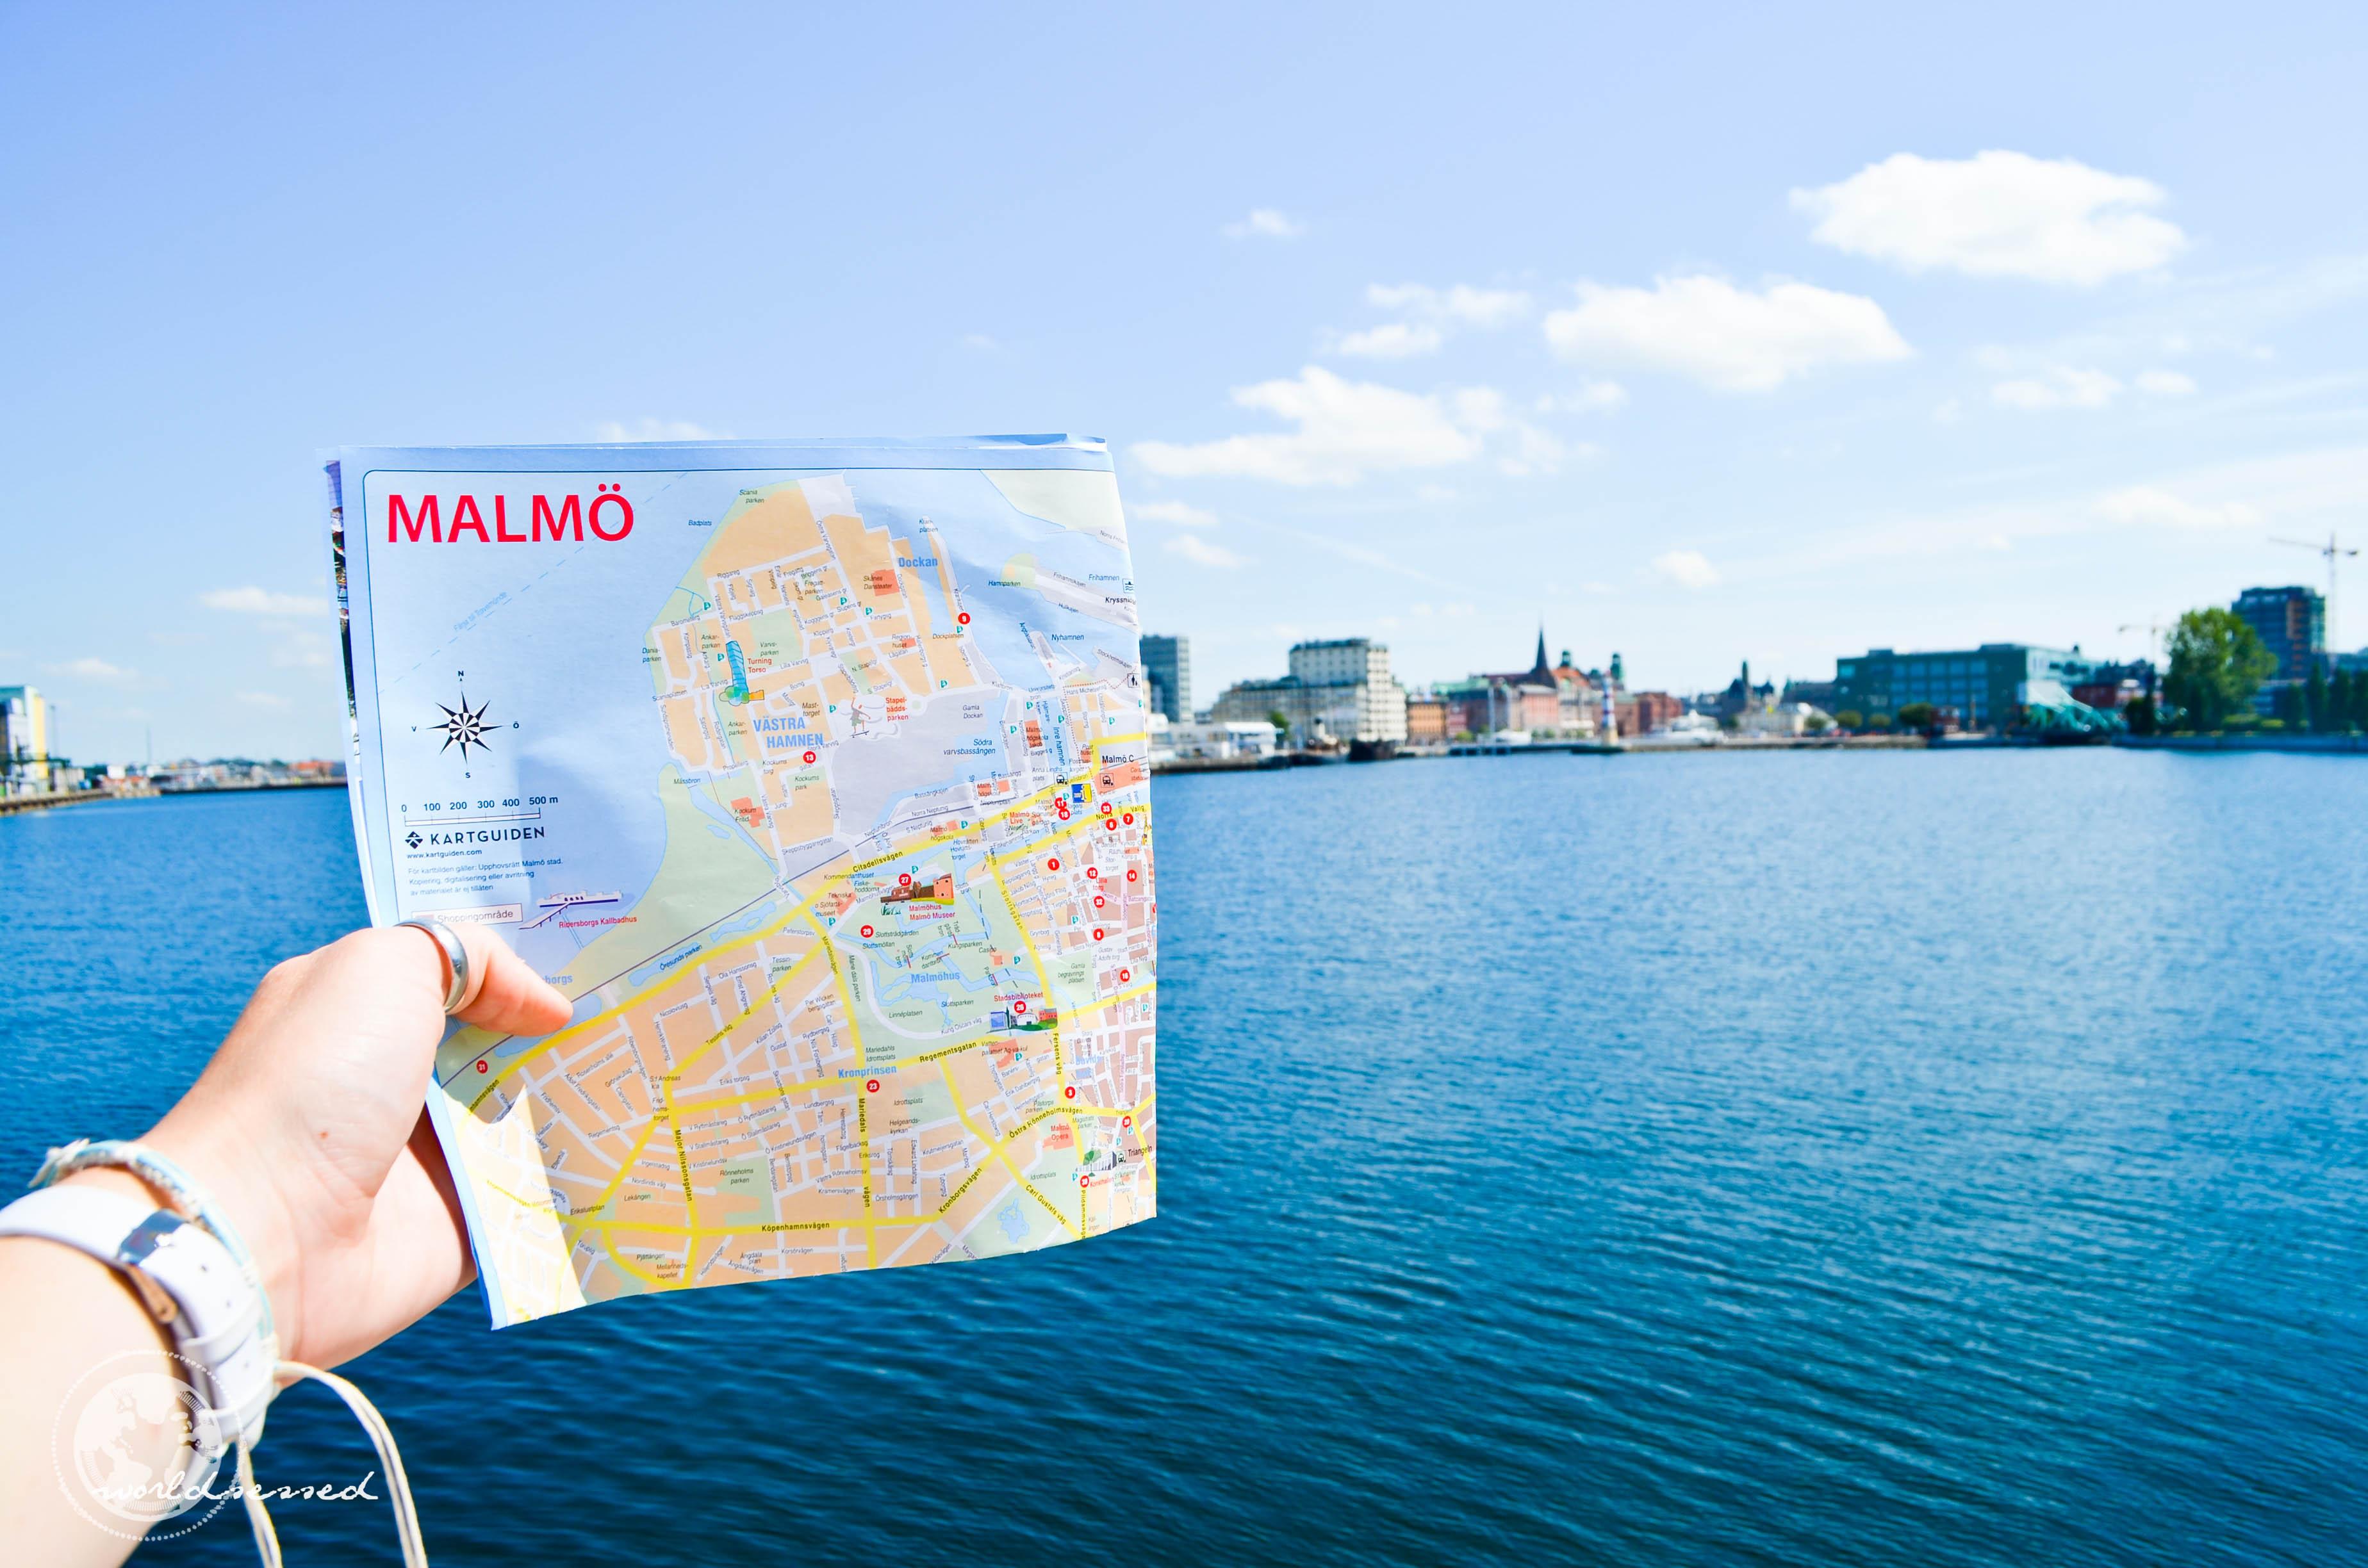 10 perfekte Städte in Europa an die du nie denkst